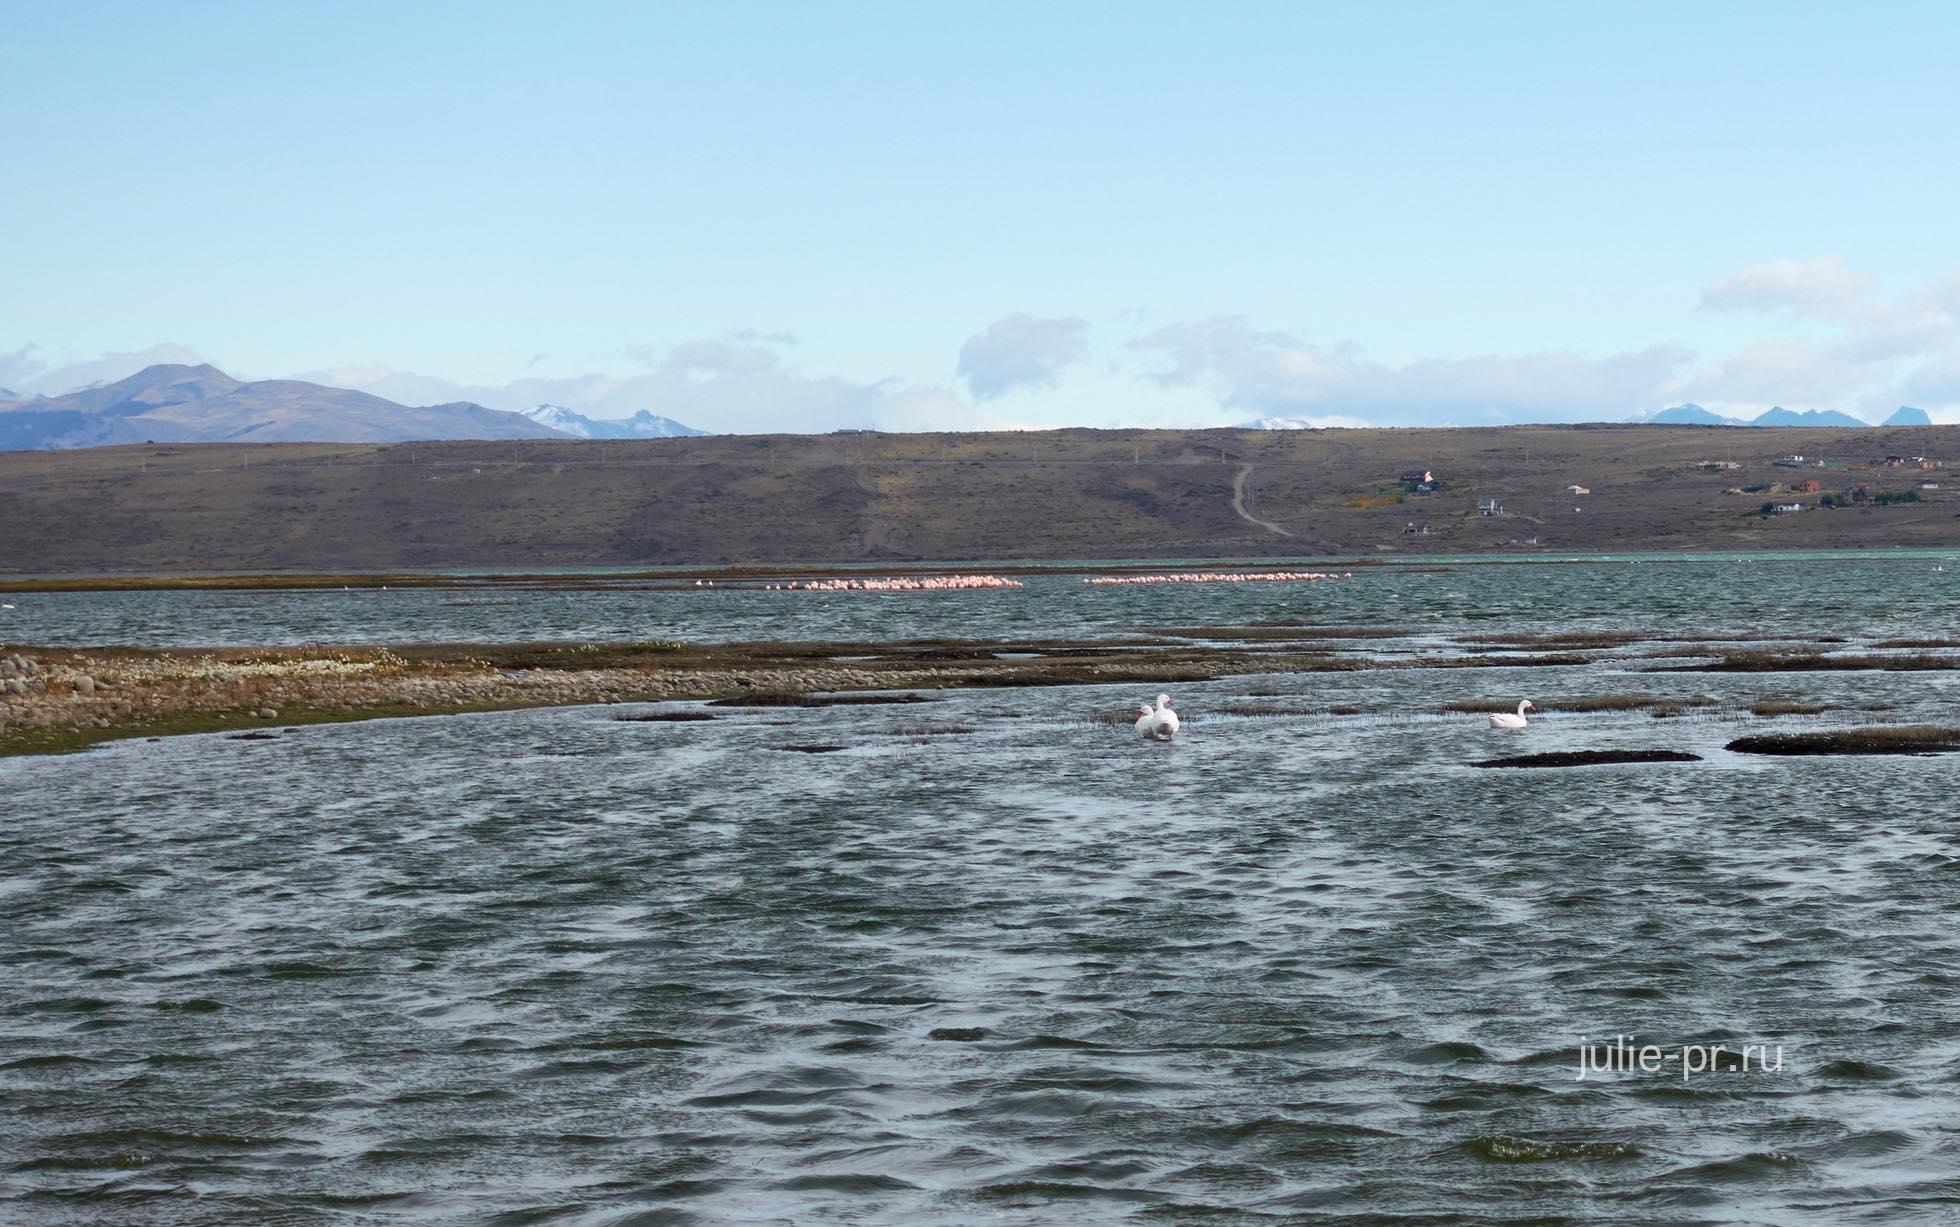 Аргентина, Патагония, Эль-Калафате, озеро Архентино, розовые фламинго